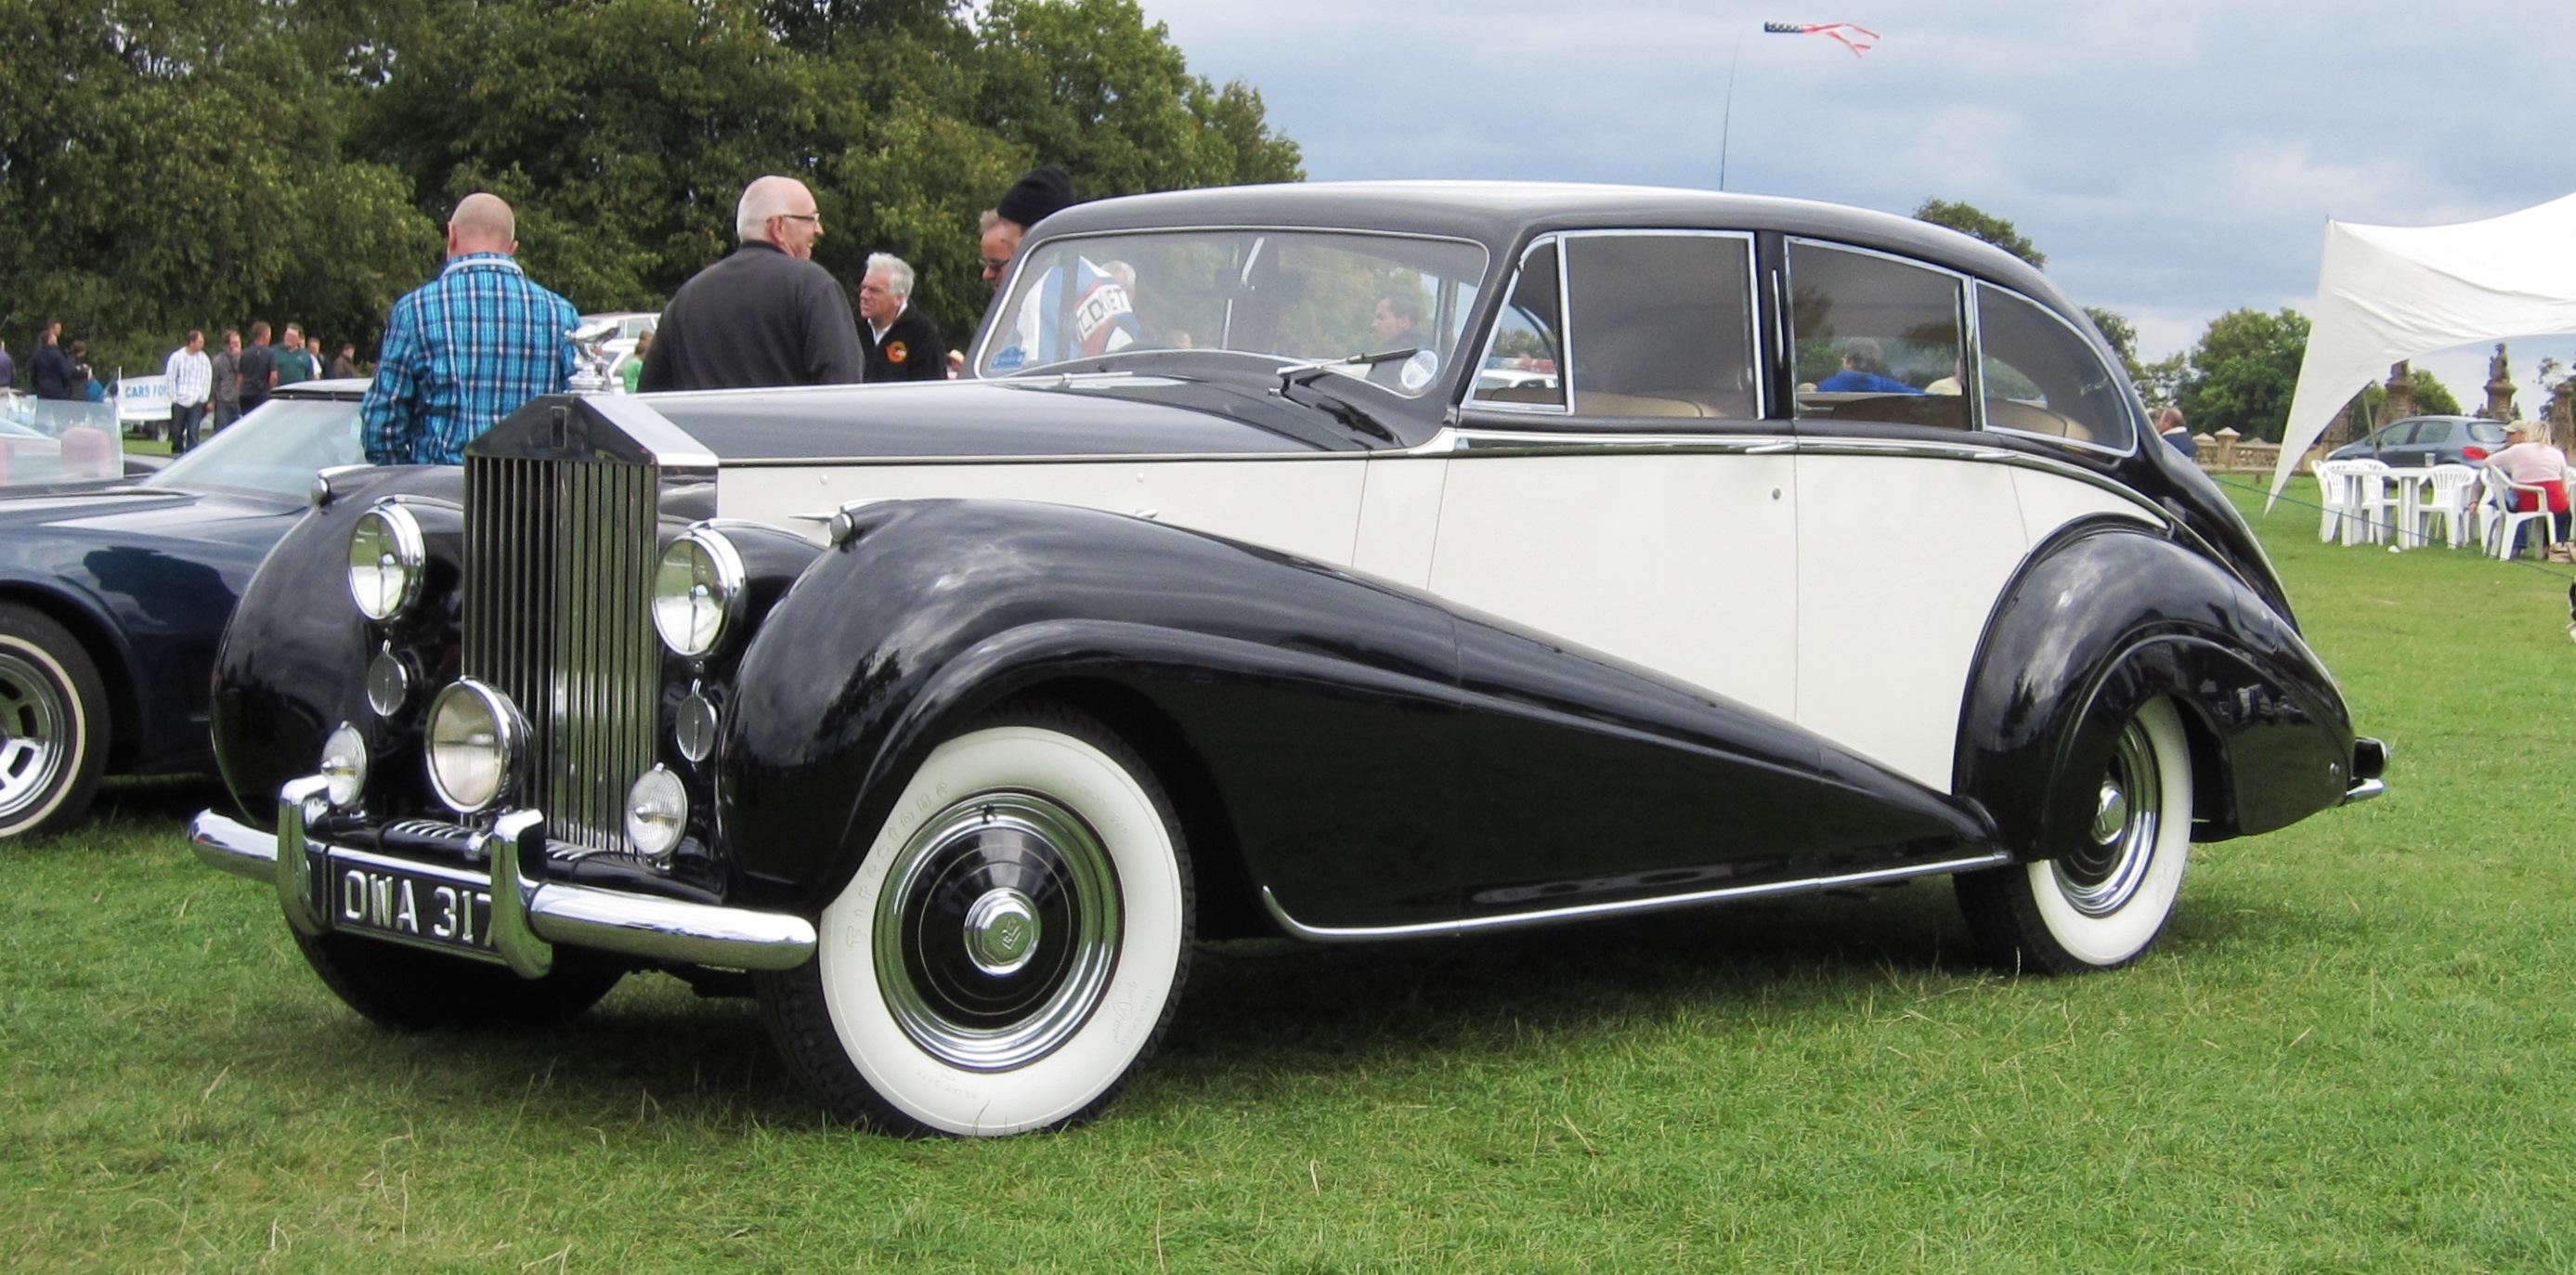 1951 Rolls Royce Silver Wraith Classic Automobiles